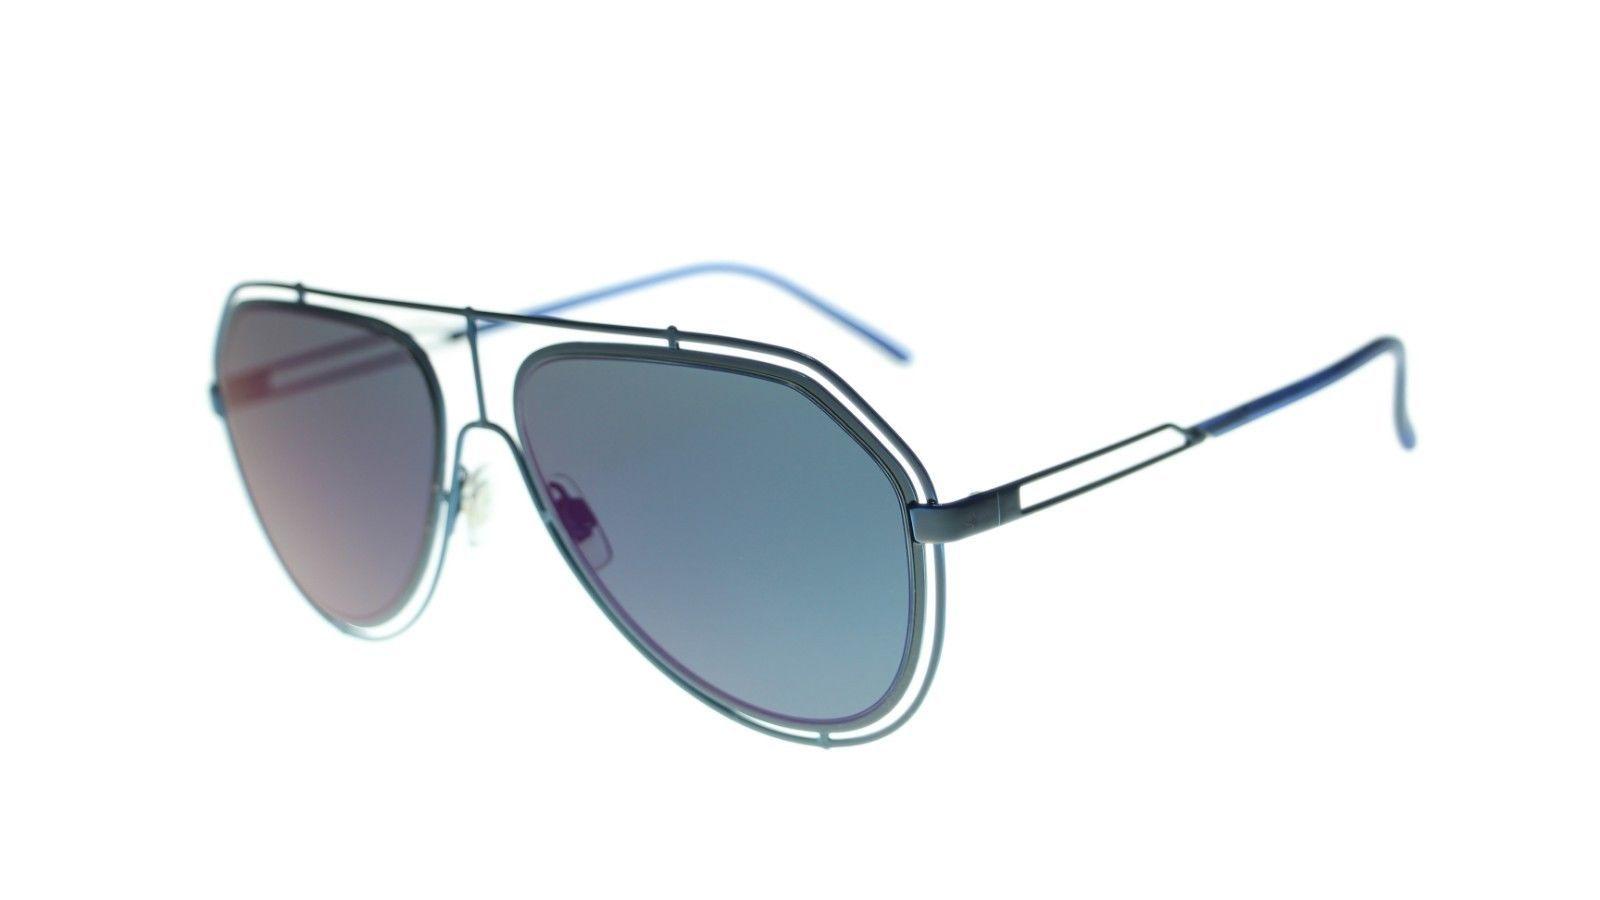 0812e0112c8 57. 57. Previous. Dolce   Gabbana DG2176 131096 Blue Metal Aviator  Sunglasses Dark Grey Lens · Dolce ...